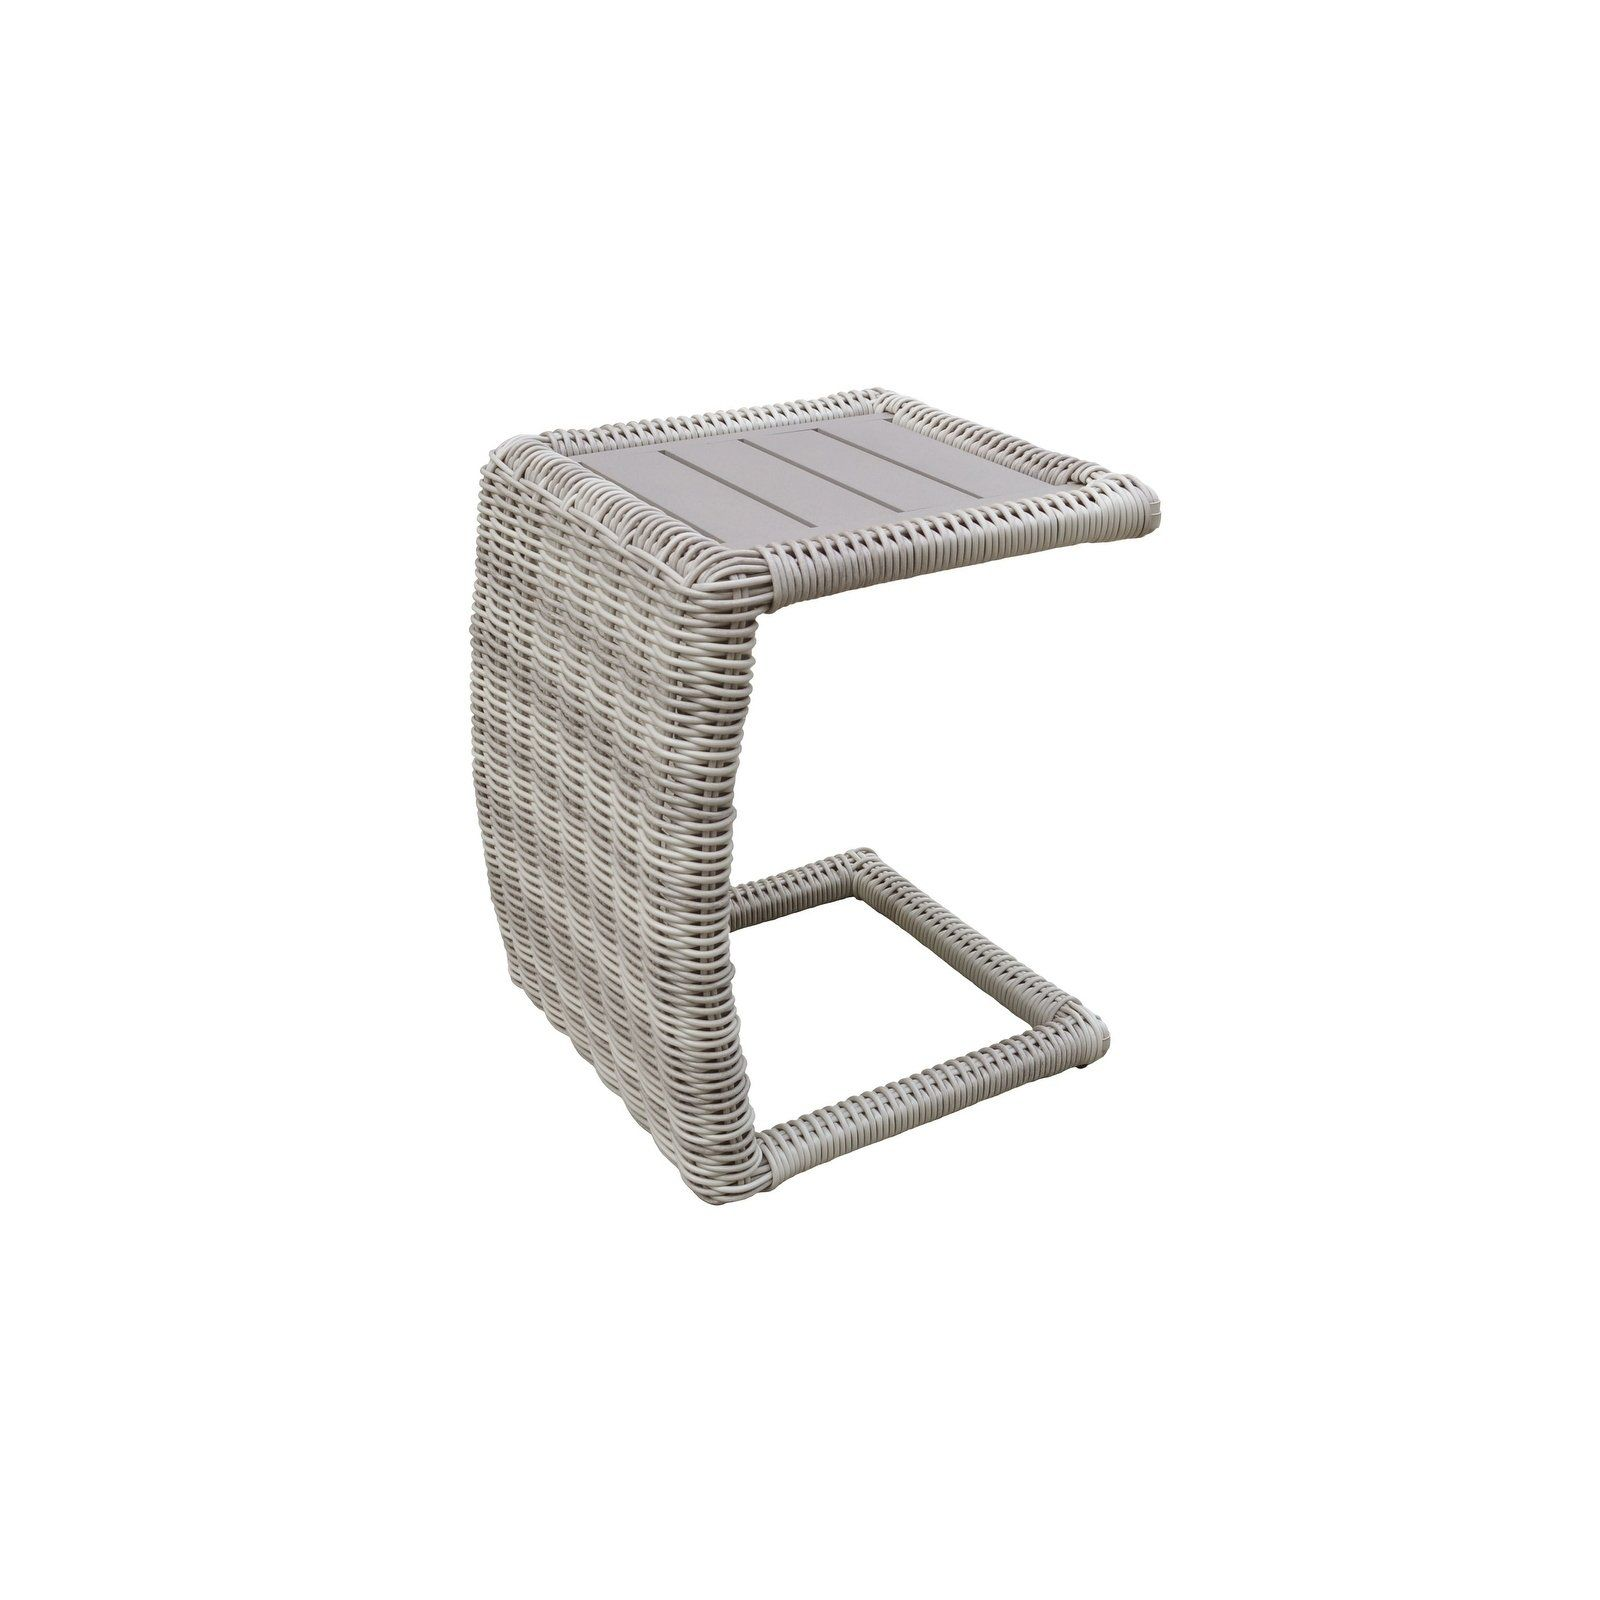 Coast Side Table Silver Tk Classics Outdoor Patio Furniture Resin Wicker